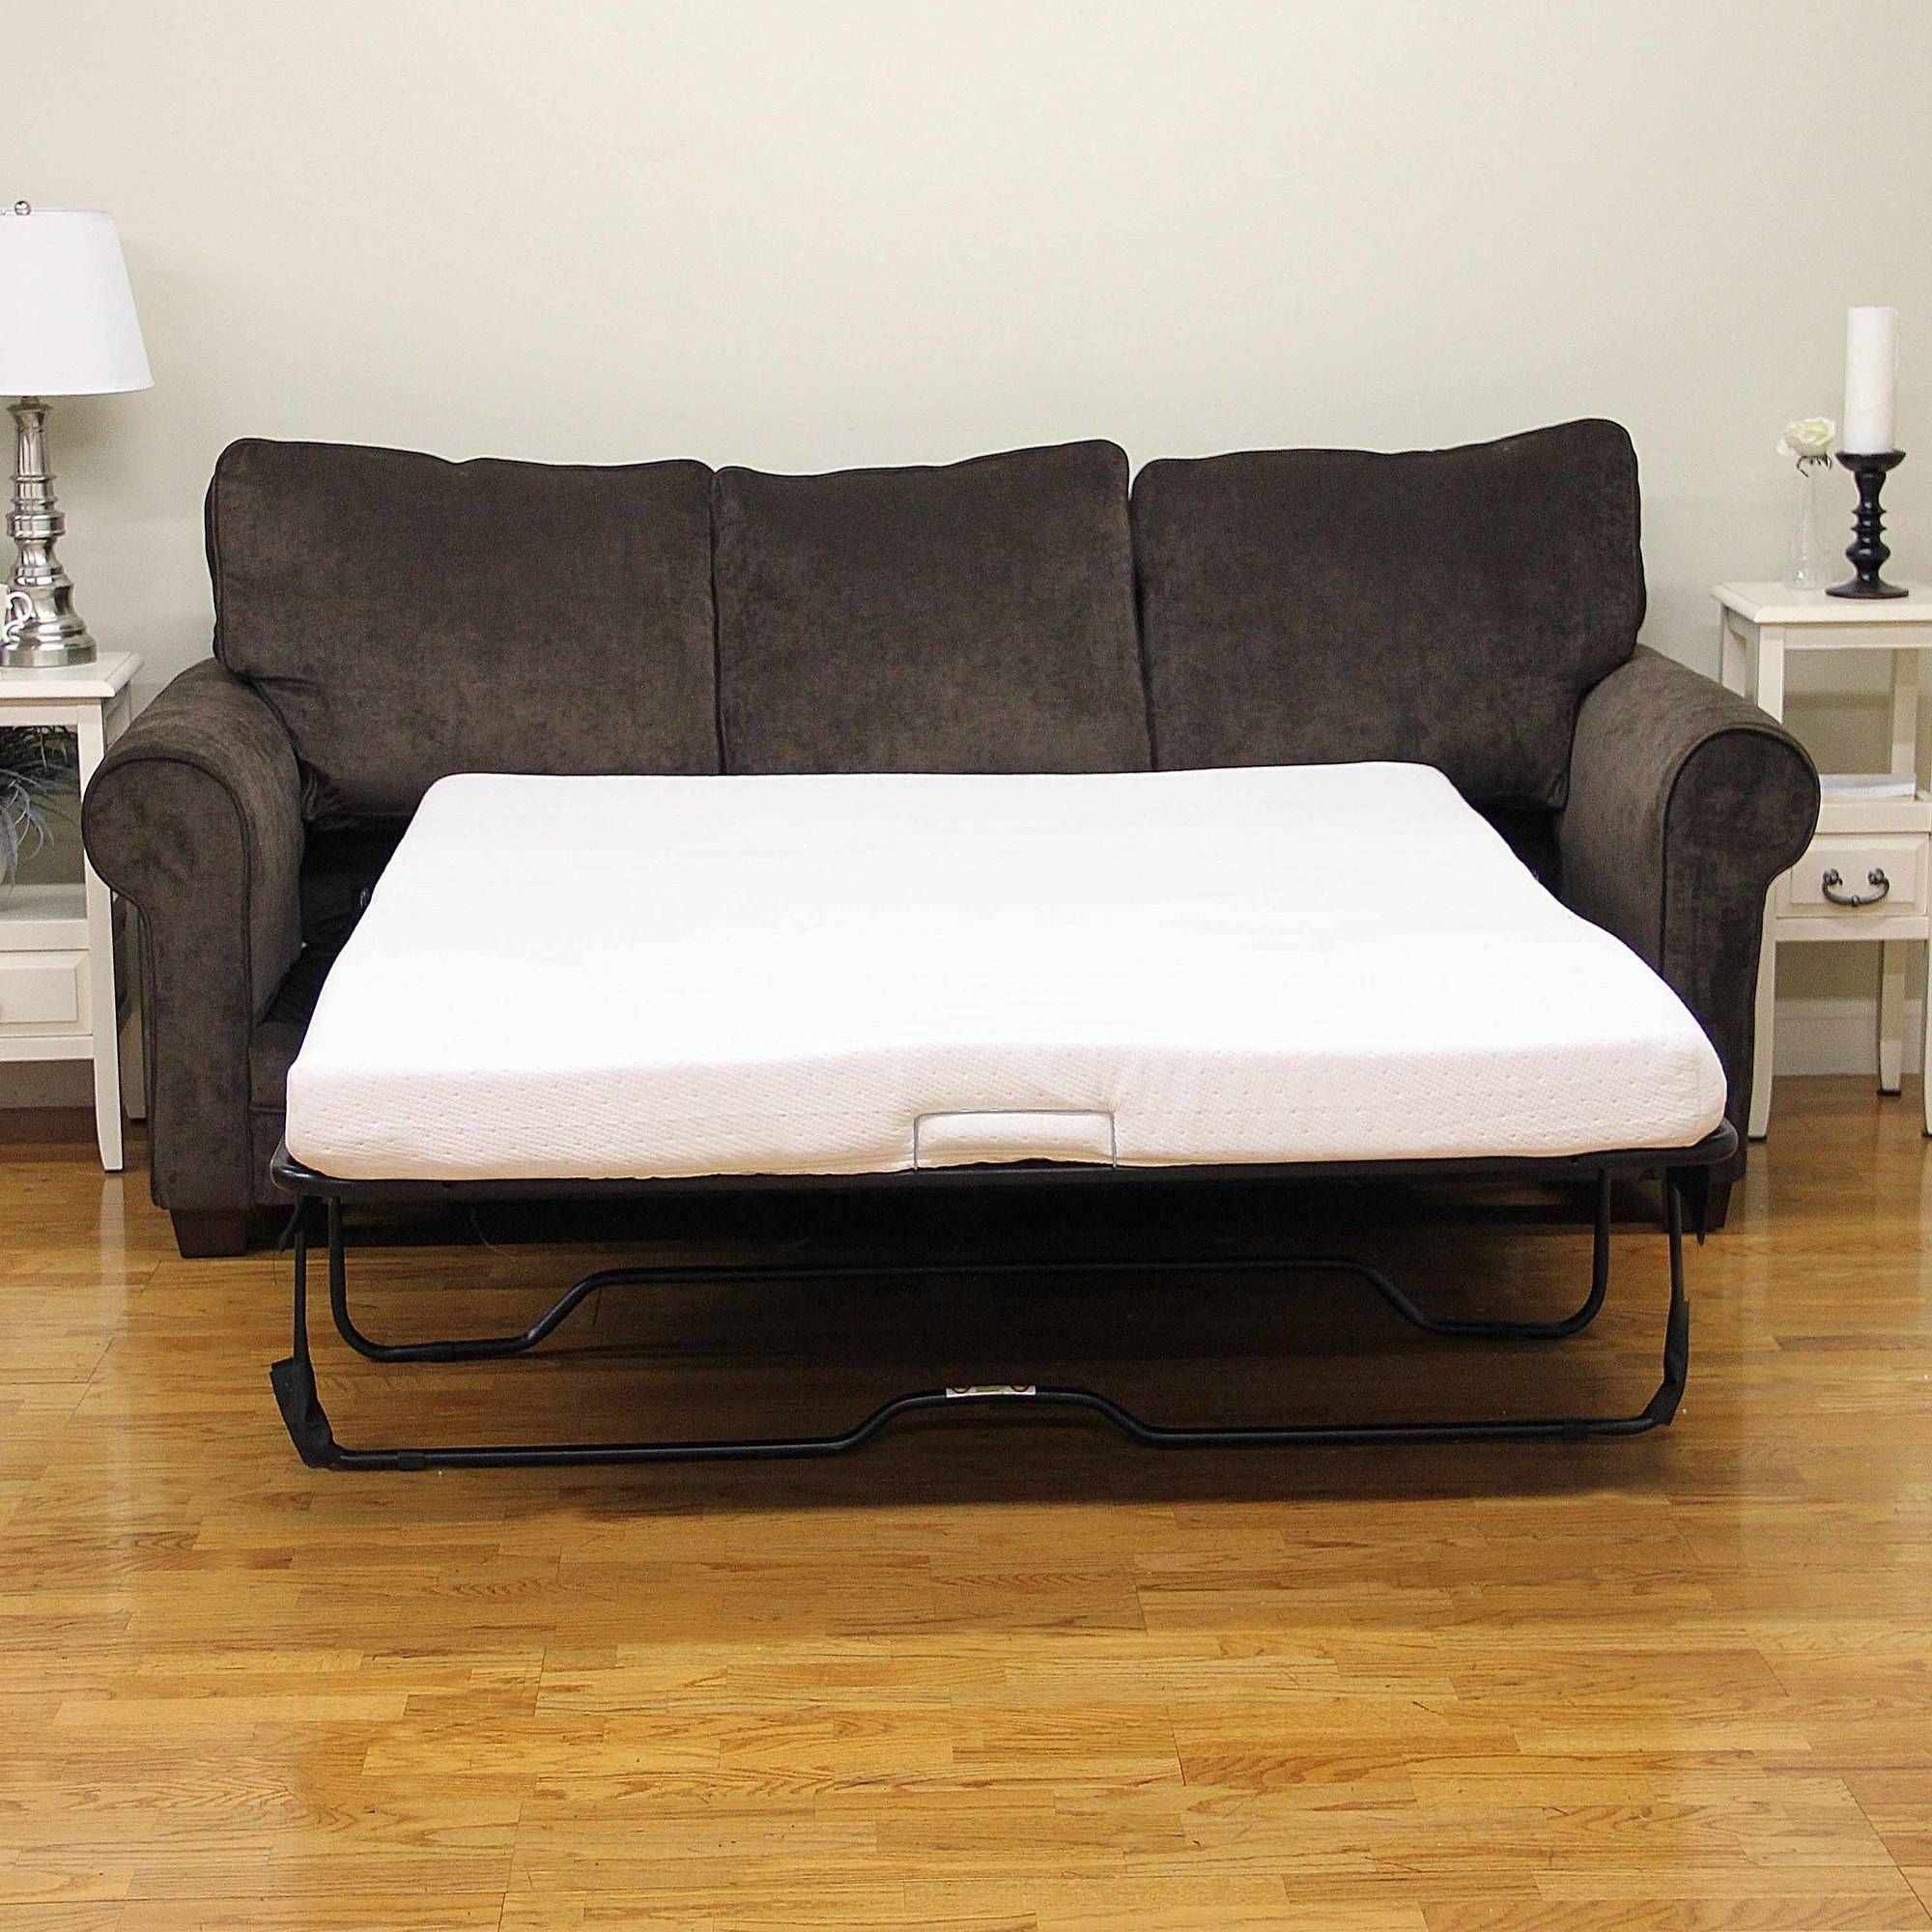 Queen Size Memory Foam Sofa Sleeper Mattress Http Tmidb Com